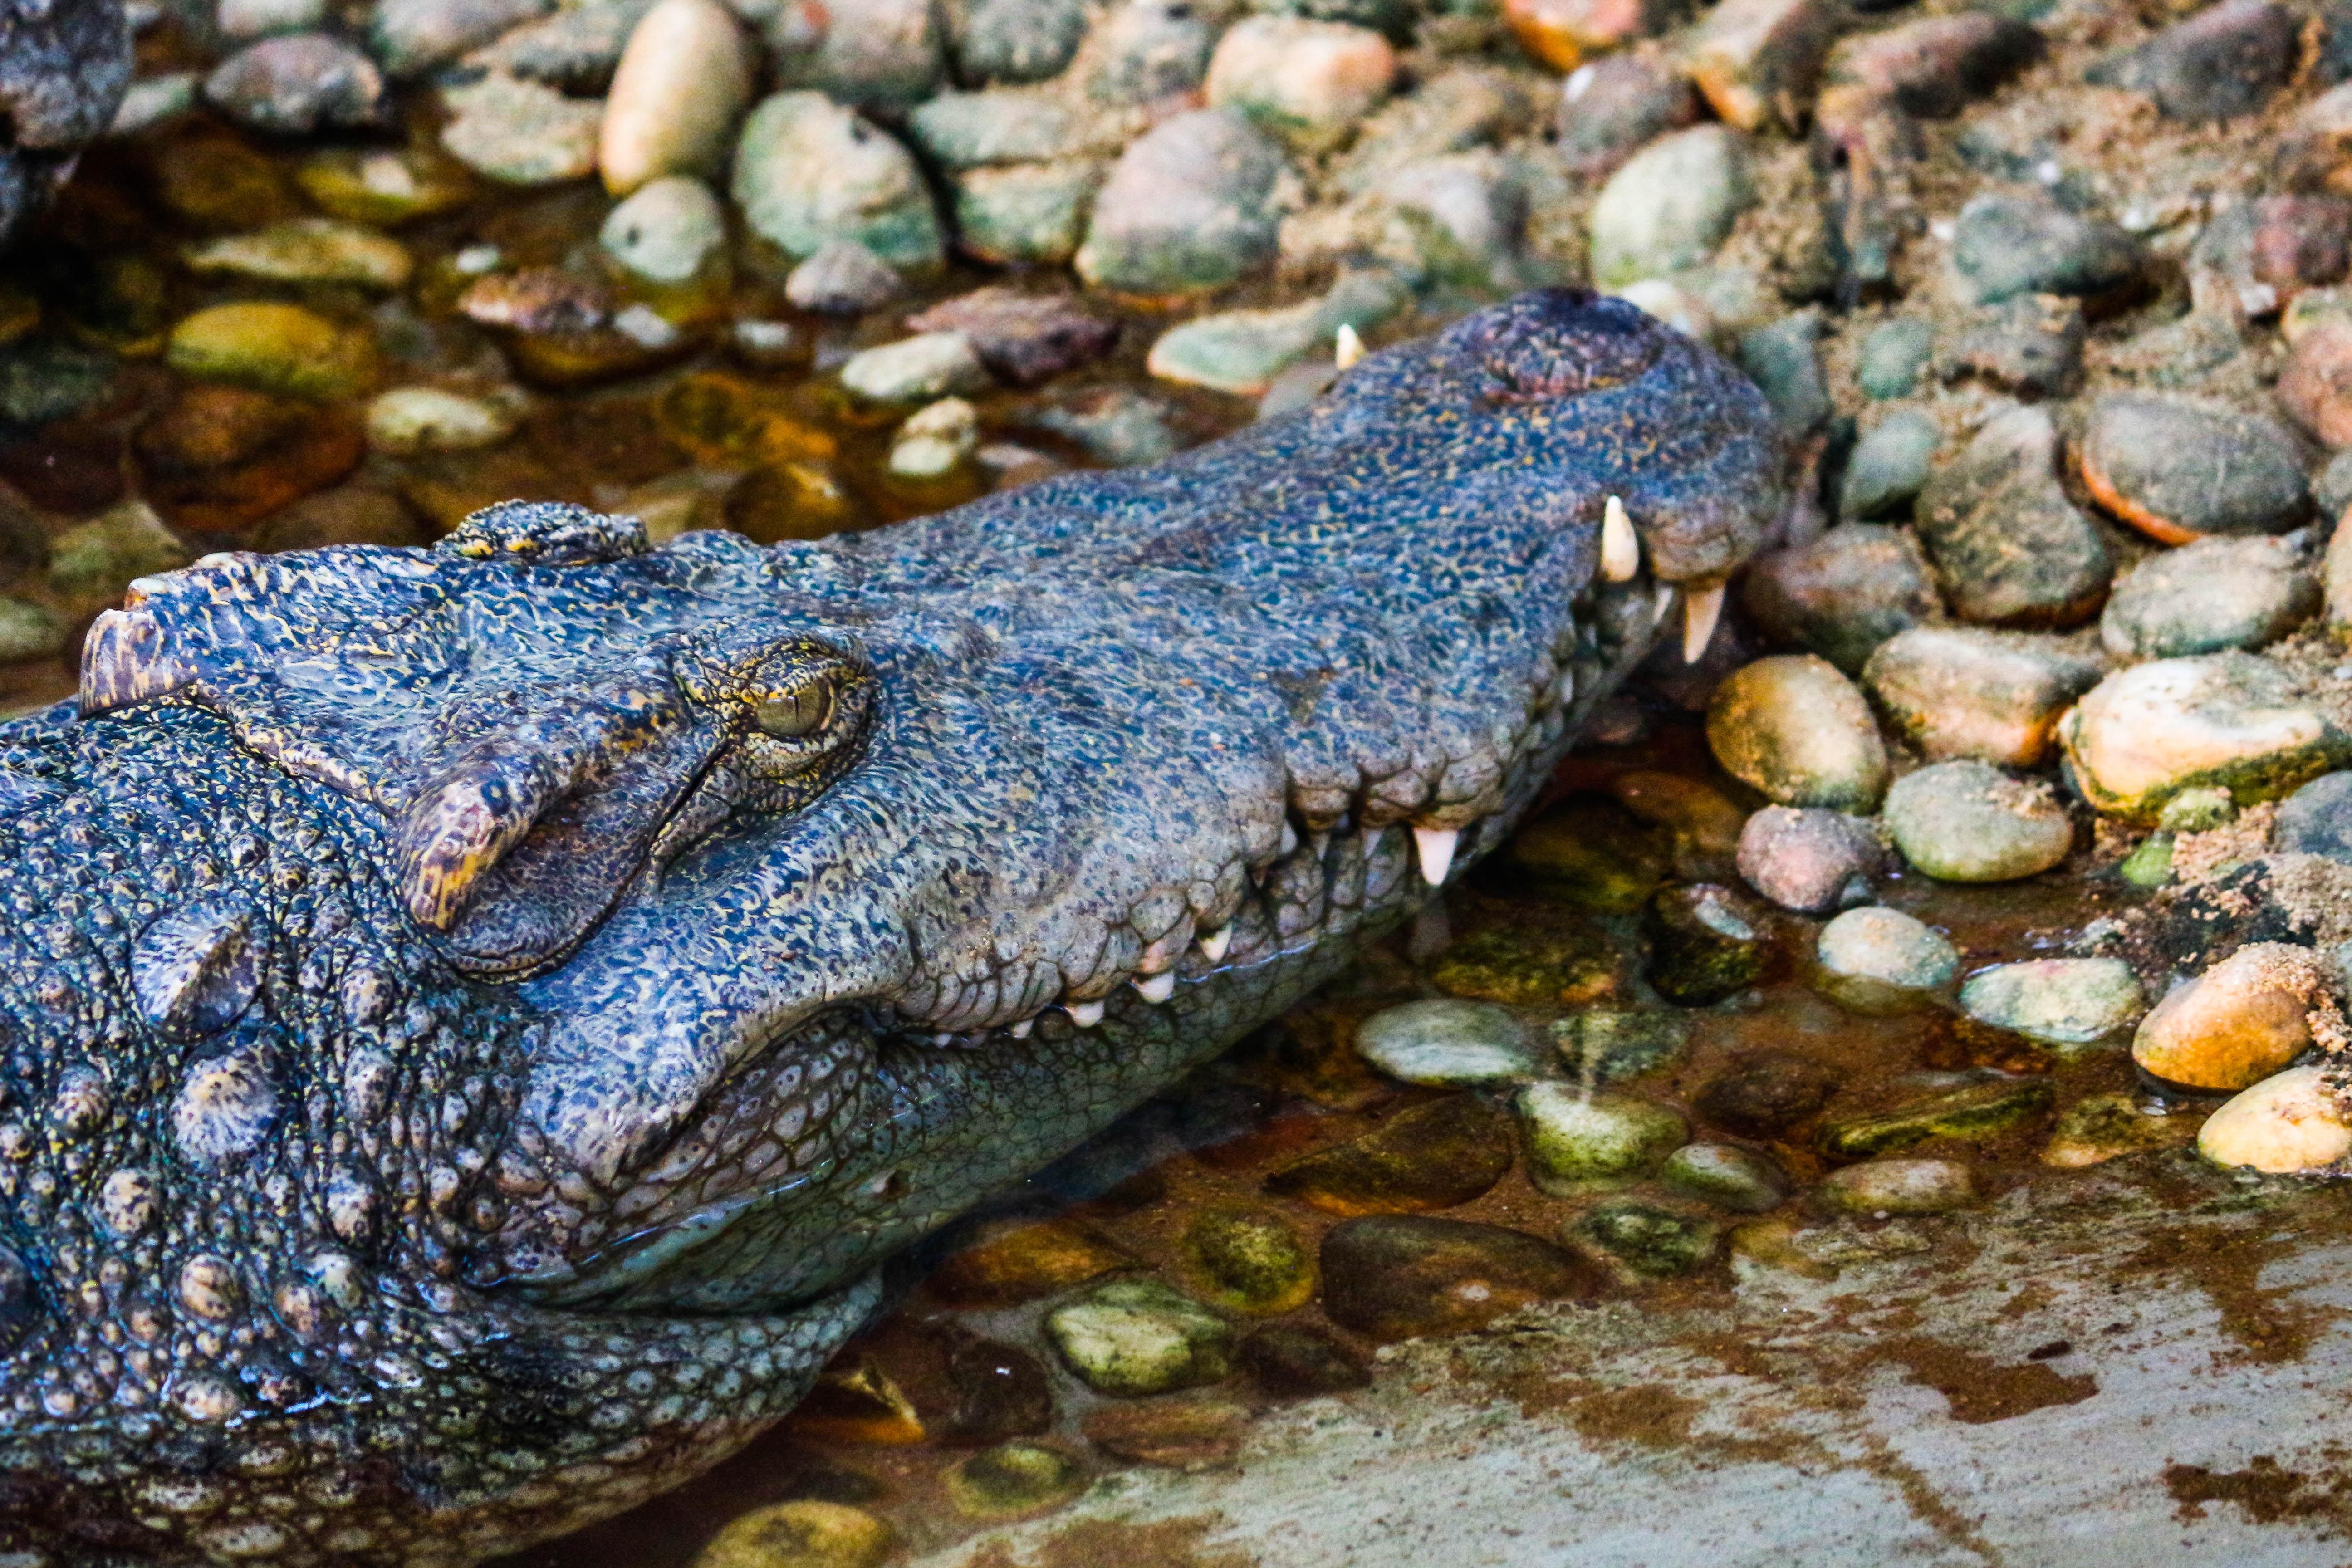 crocodile in body of water